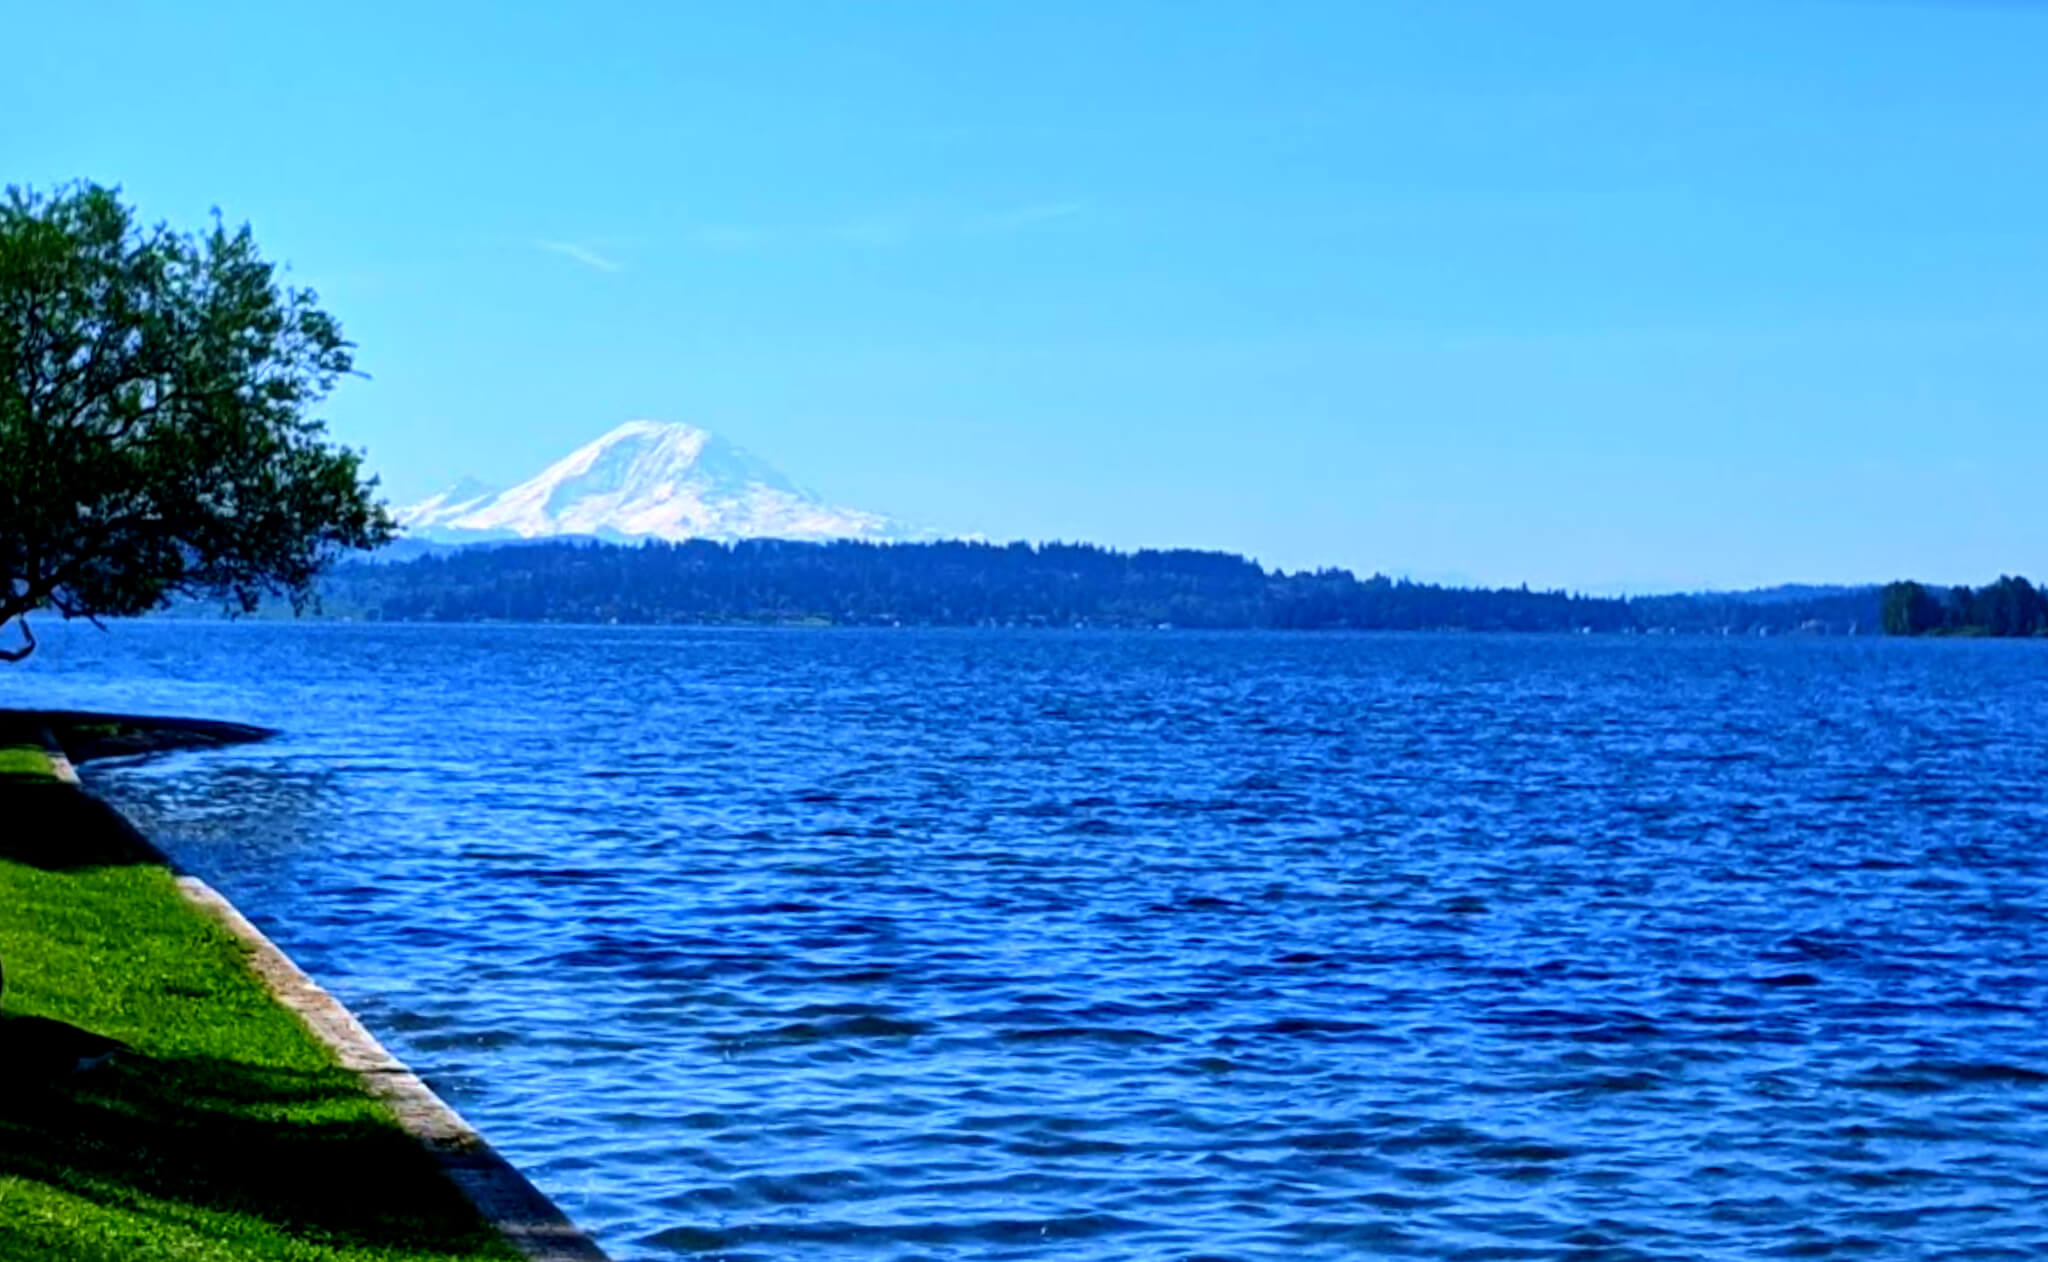 Washington-Lake-Fishing-Report-Guide-WA-04